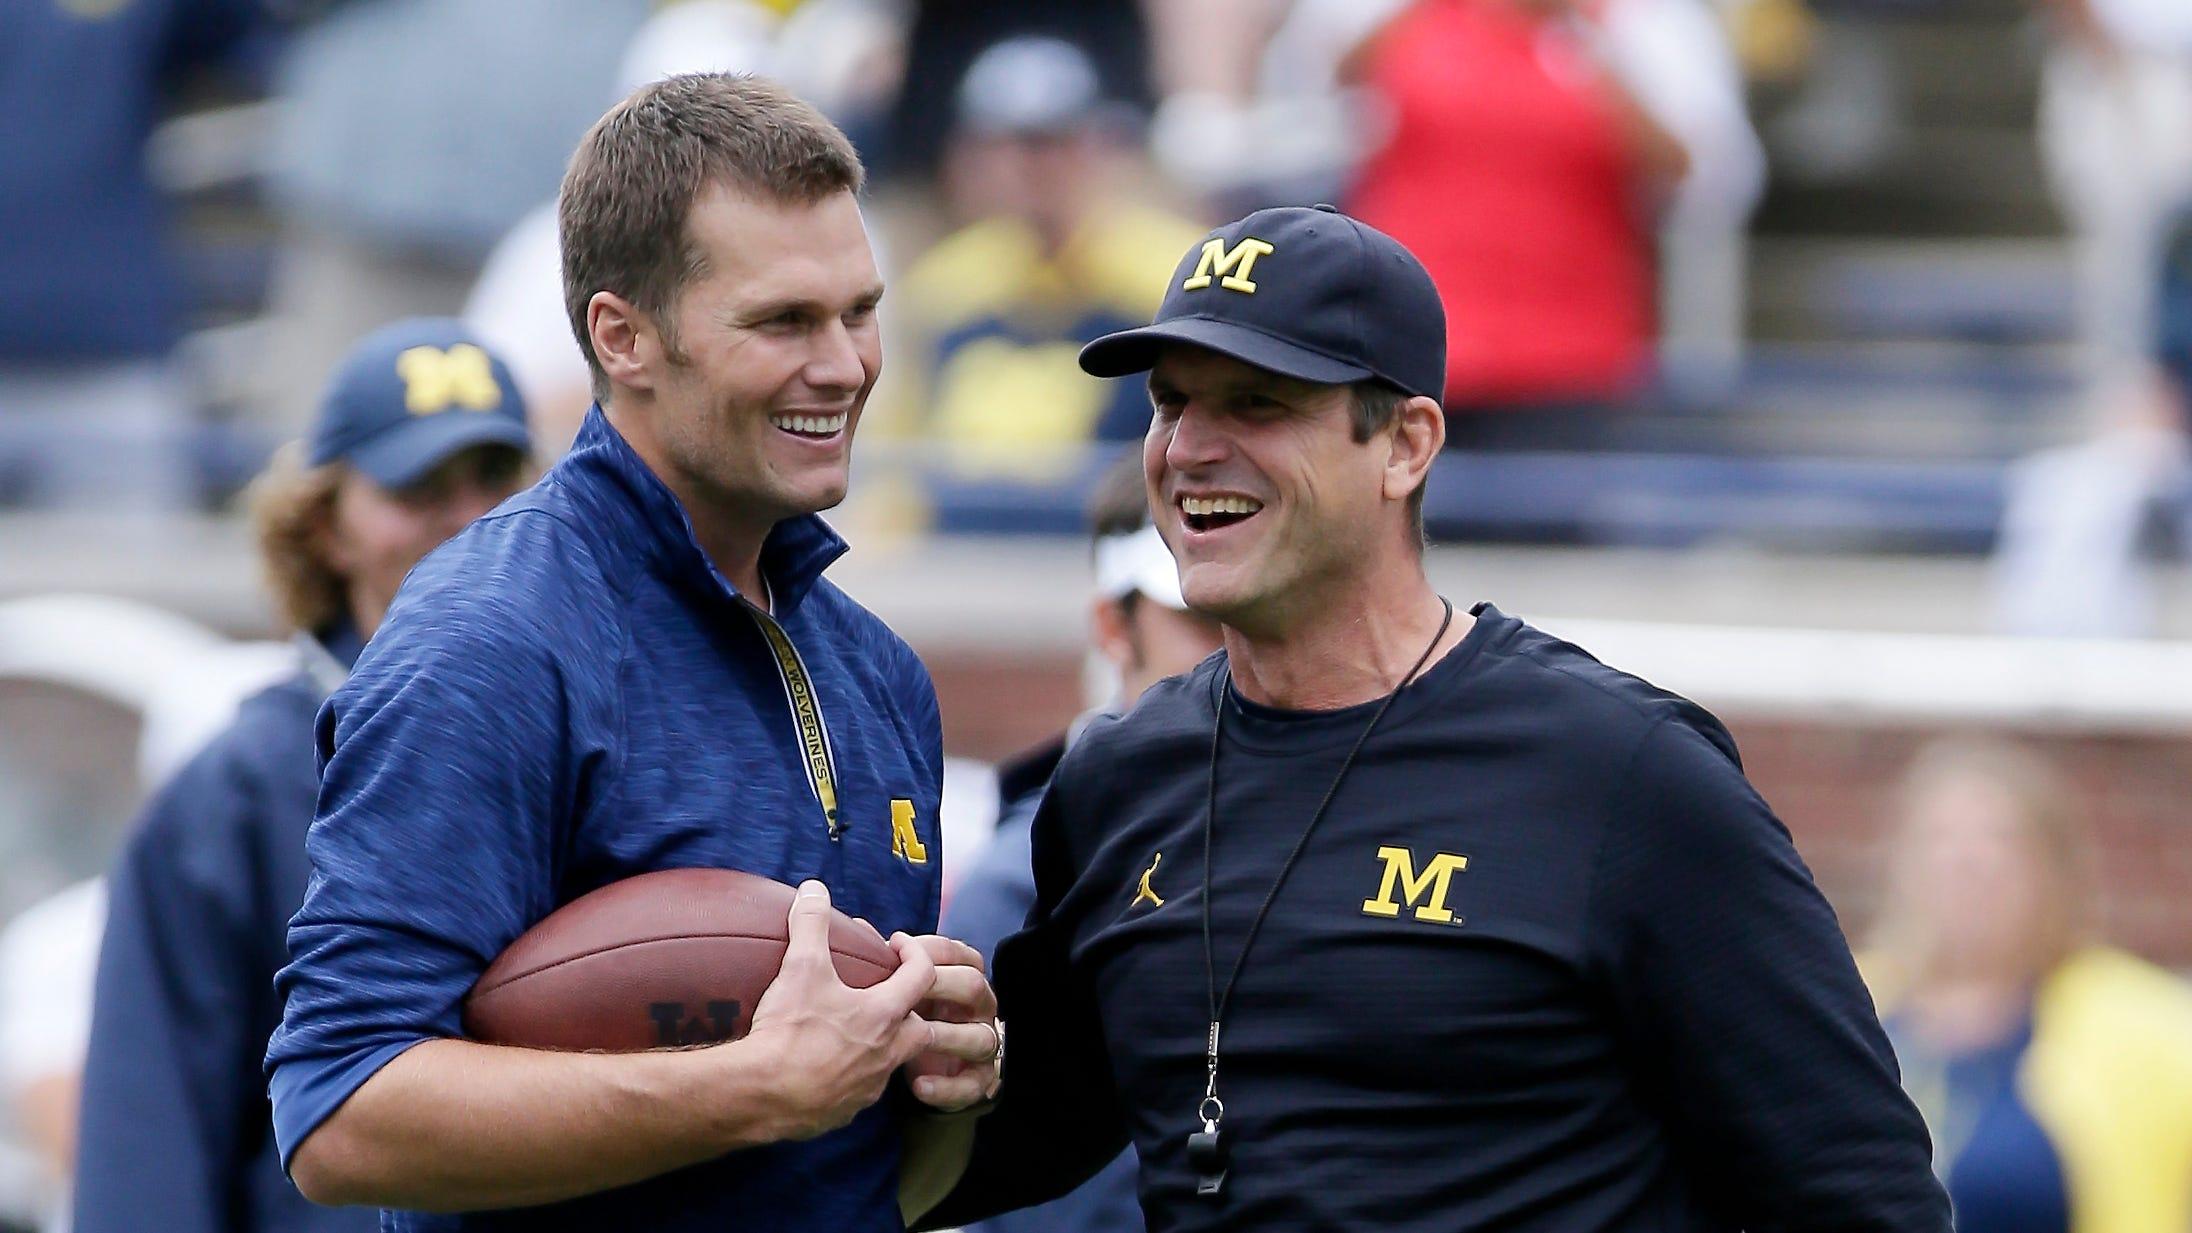 Tom Brady and Jim Harbaugh